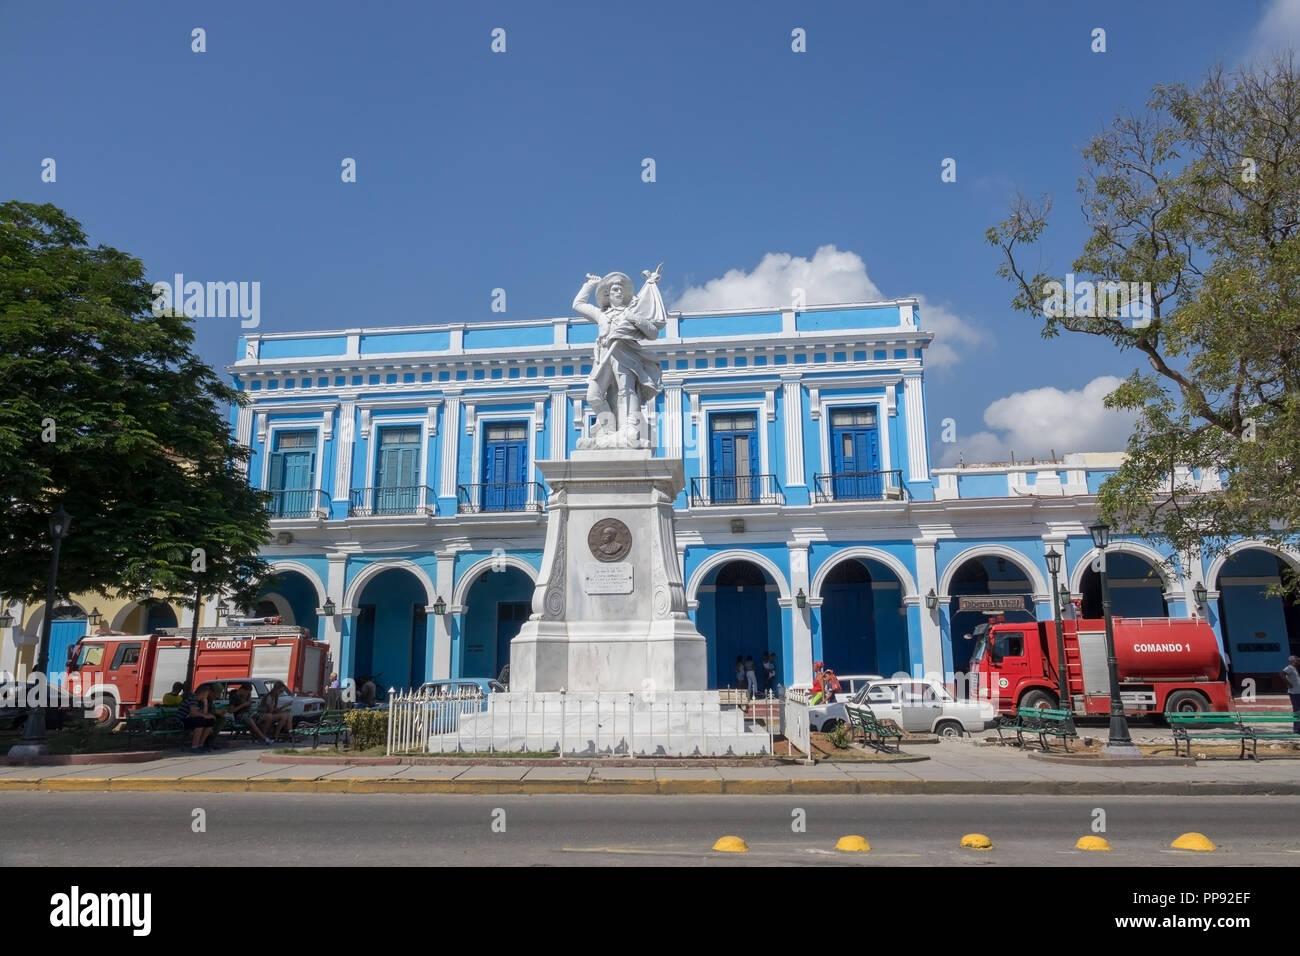 CUB, Kuba, Havanna, 11.03.2018, Matanzas Plaza de La Vigia Standbild und Feuerwache [2018 Christoph Hermann] - Stock Image